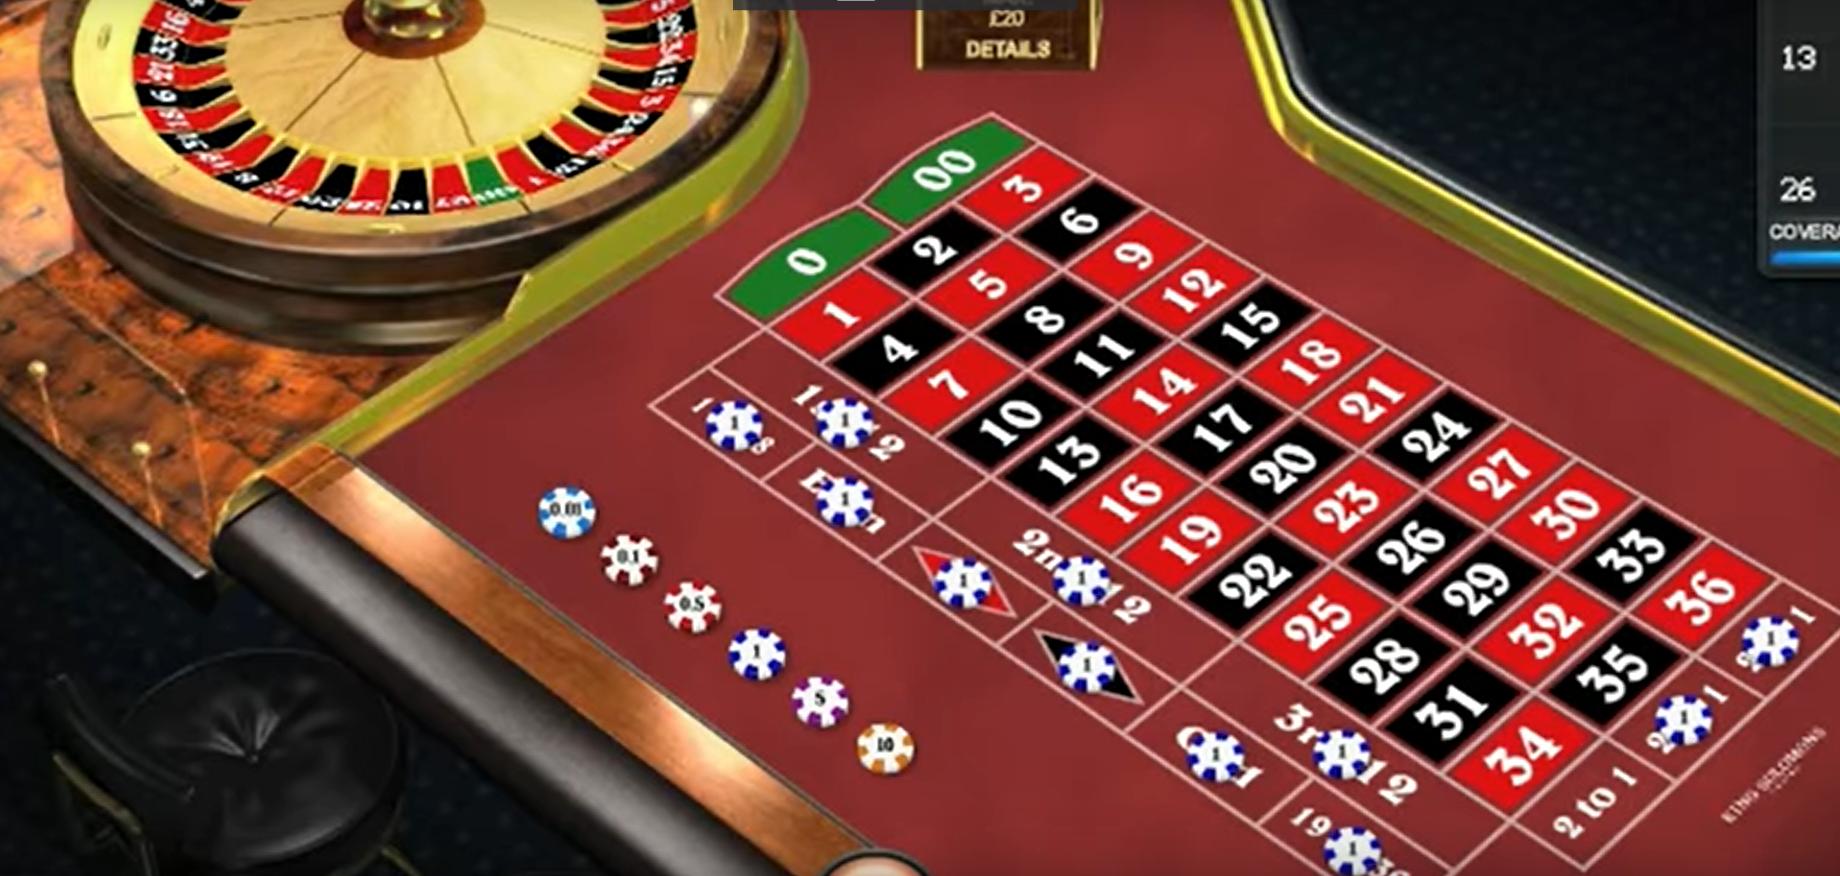 Casino list roulette championship Sehsucht